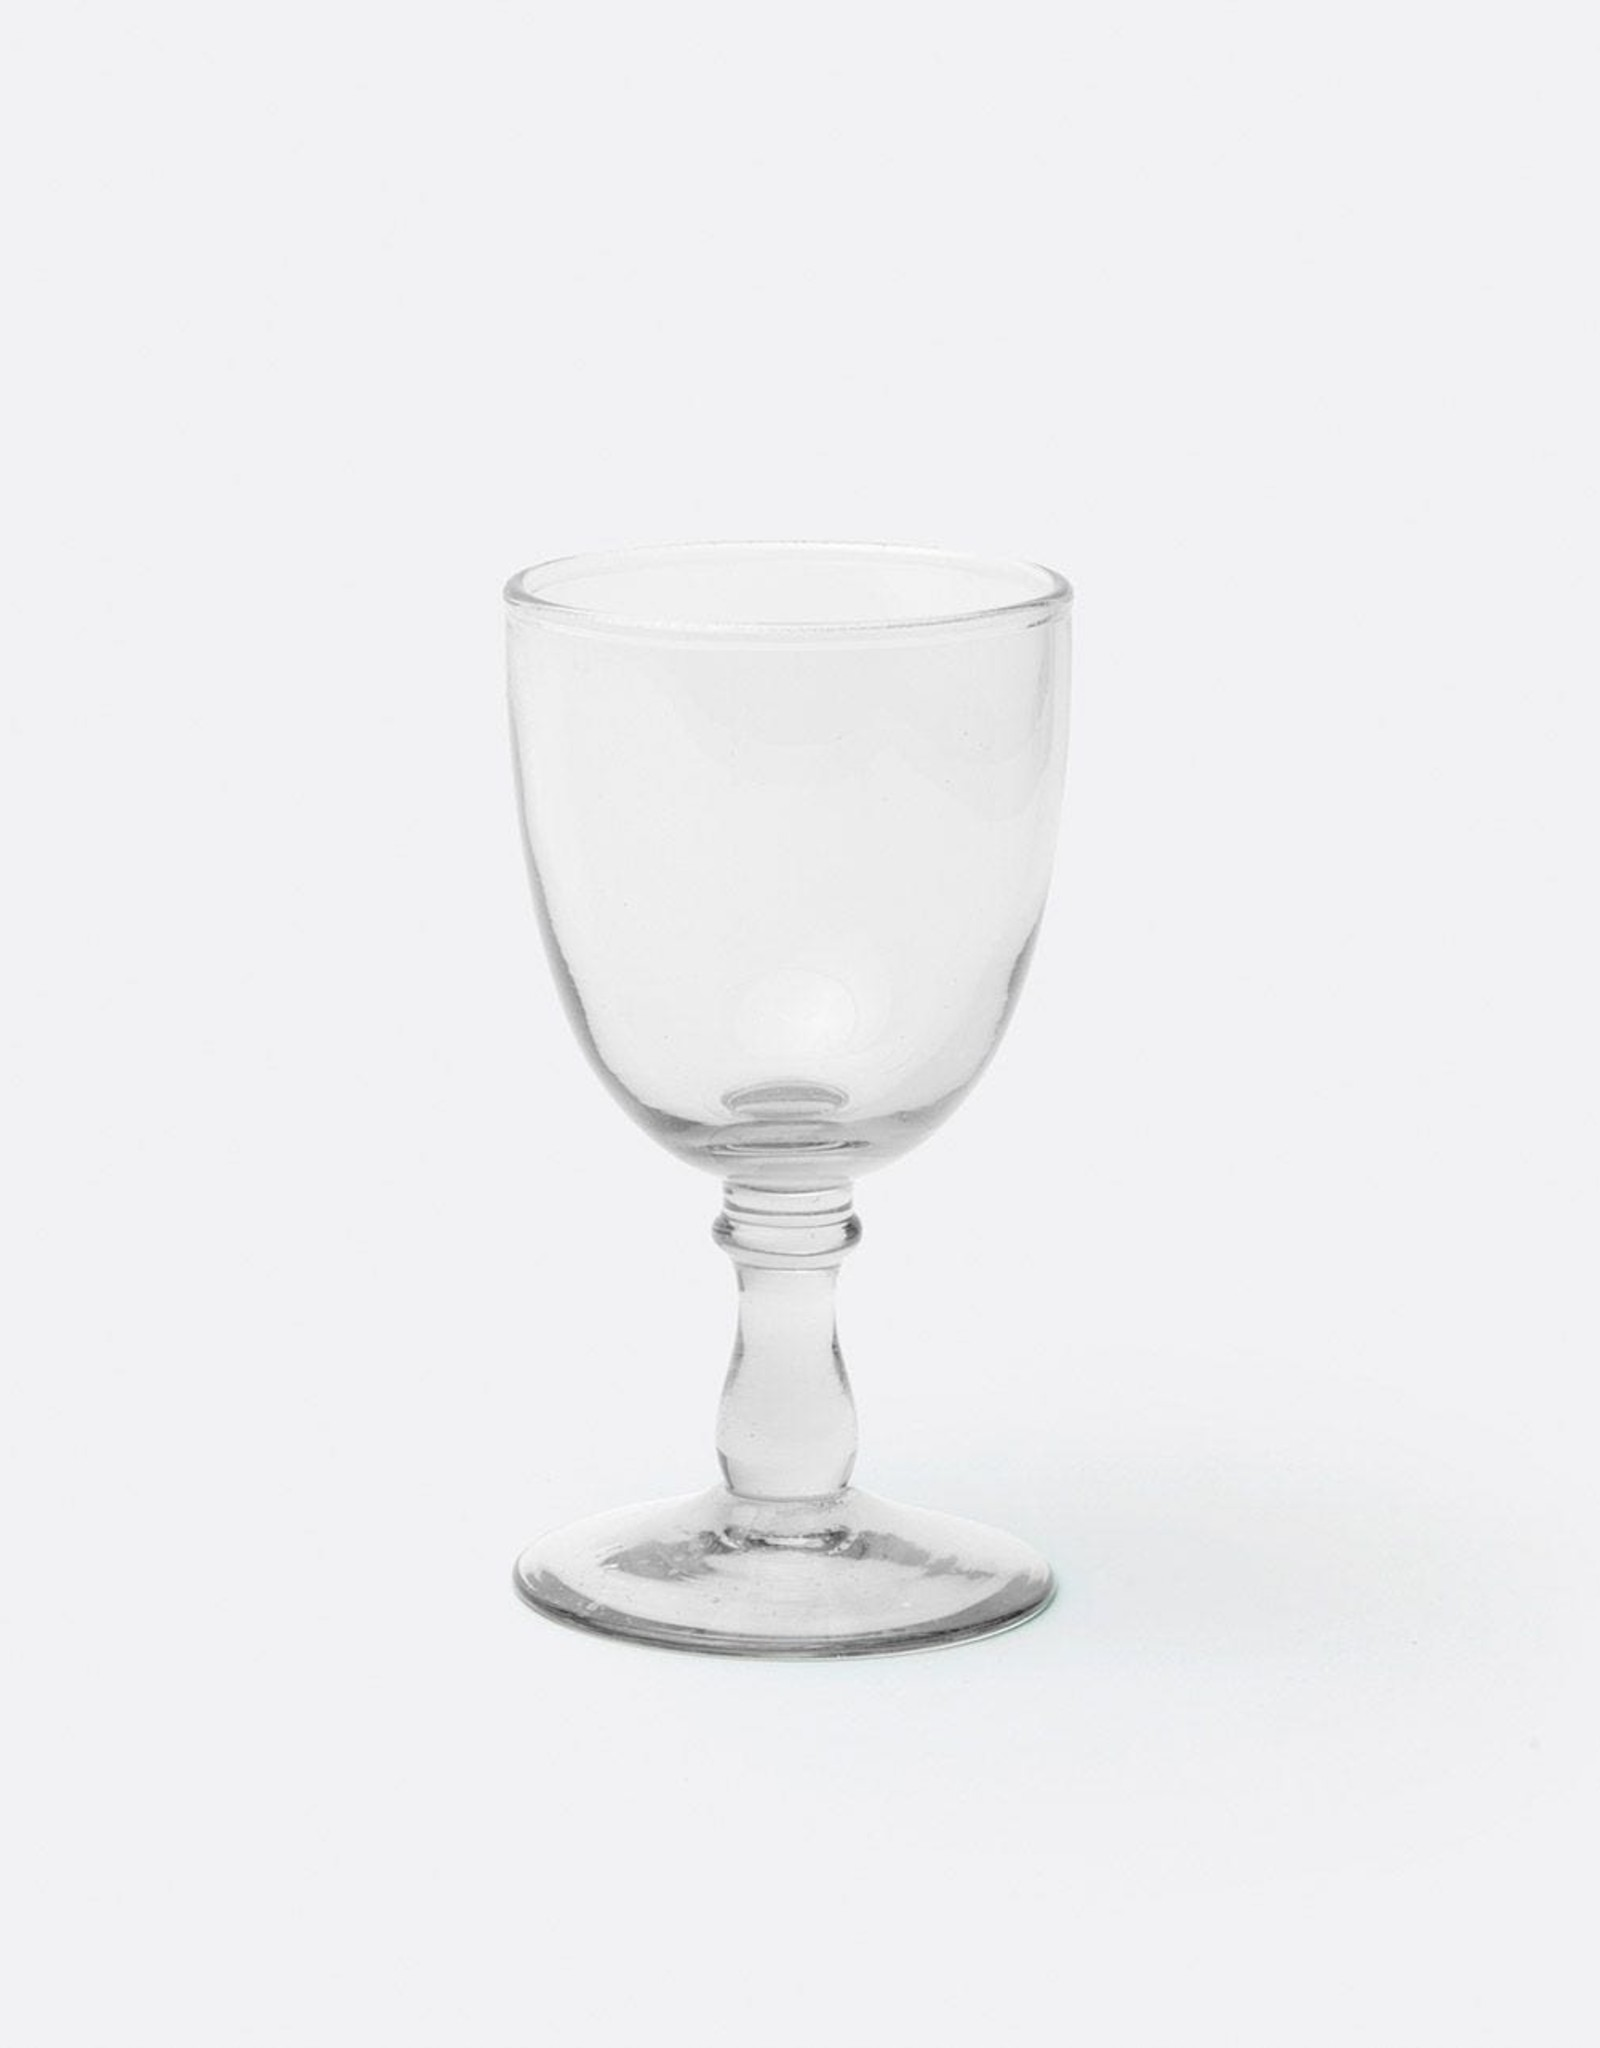 Blue Pheasant Celeste Glassware